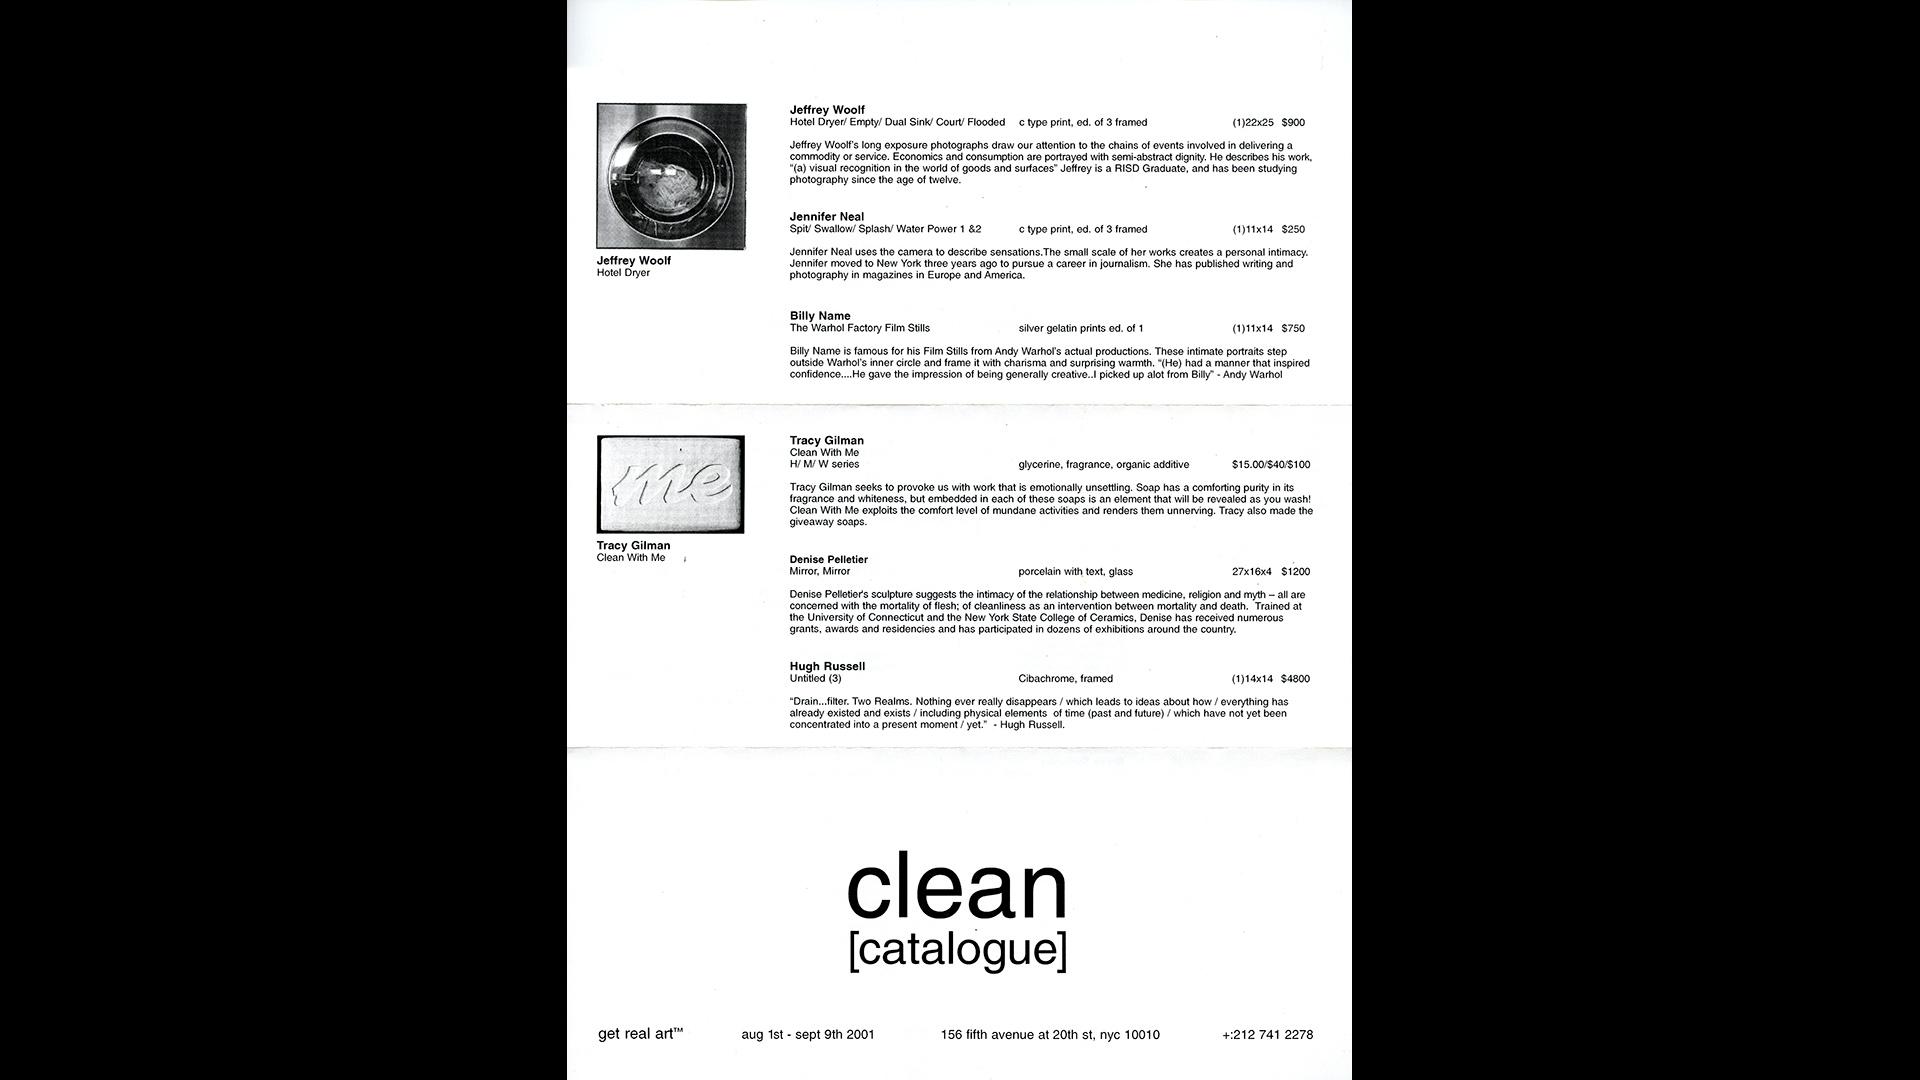 clean catalogue005 copy.jpg